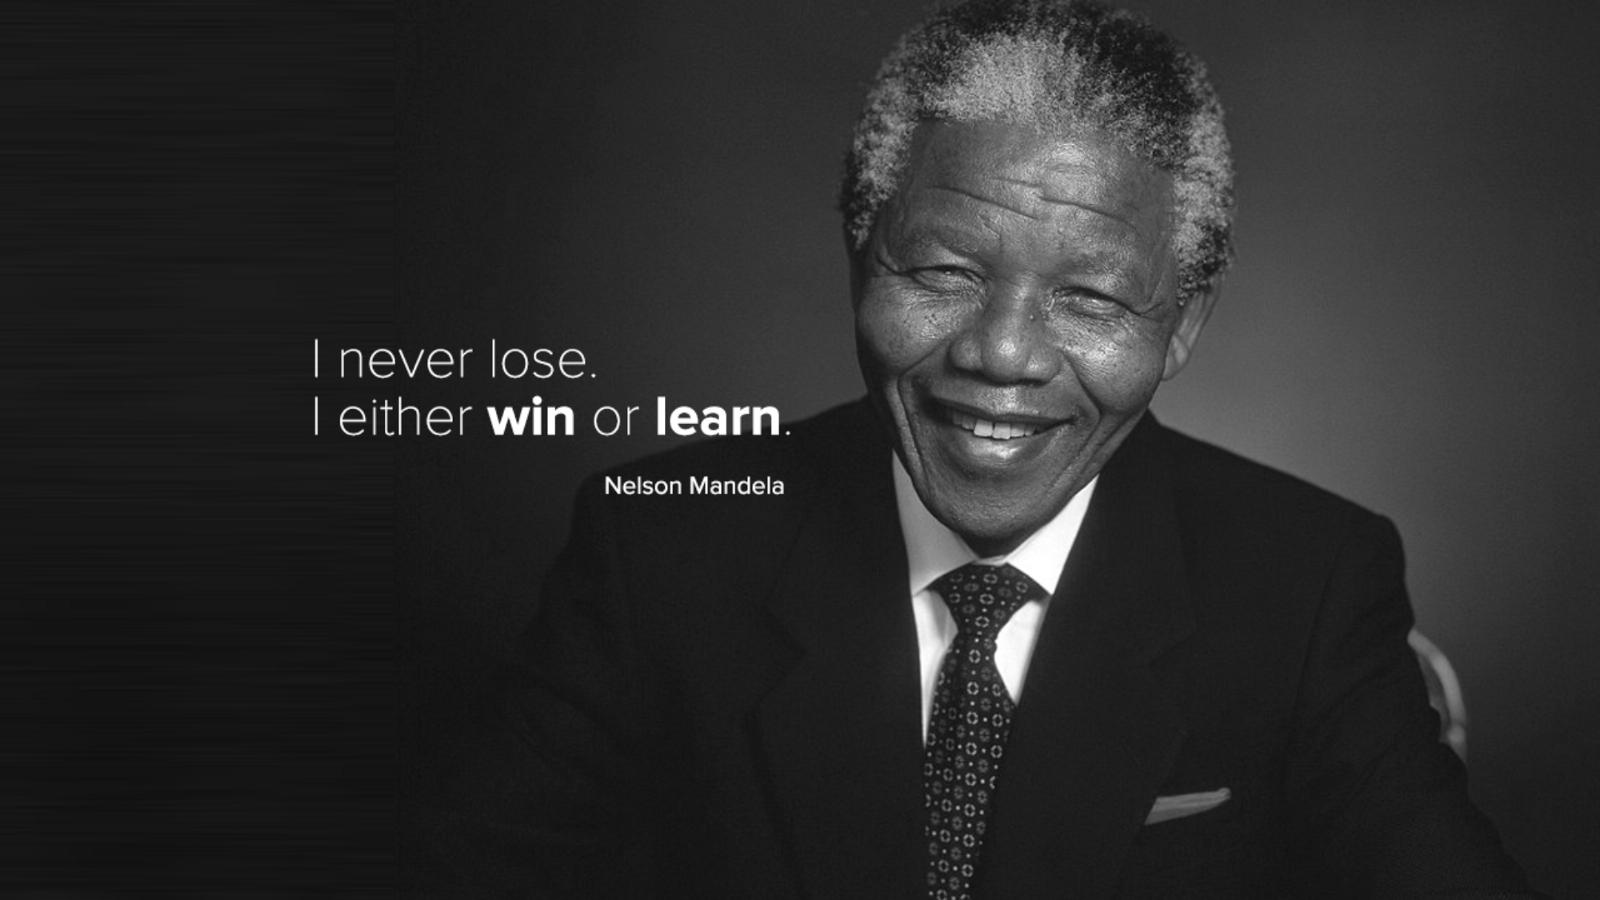 1 Soqpf1teoe4 Djfobgo5hg Png 1600 900 Nelson Mandela Nelson Mandela Quotes Smile Quotes